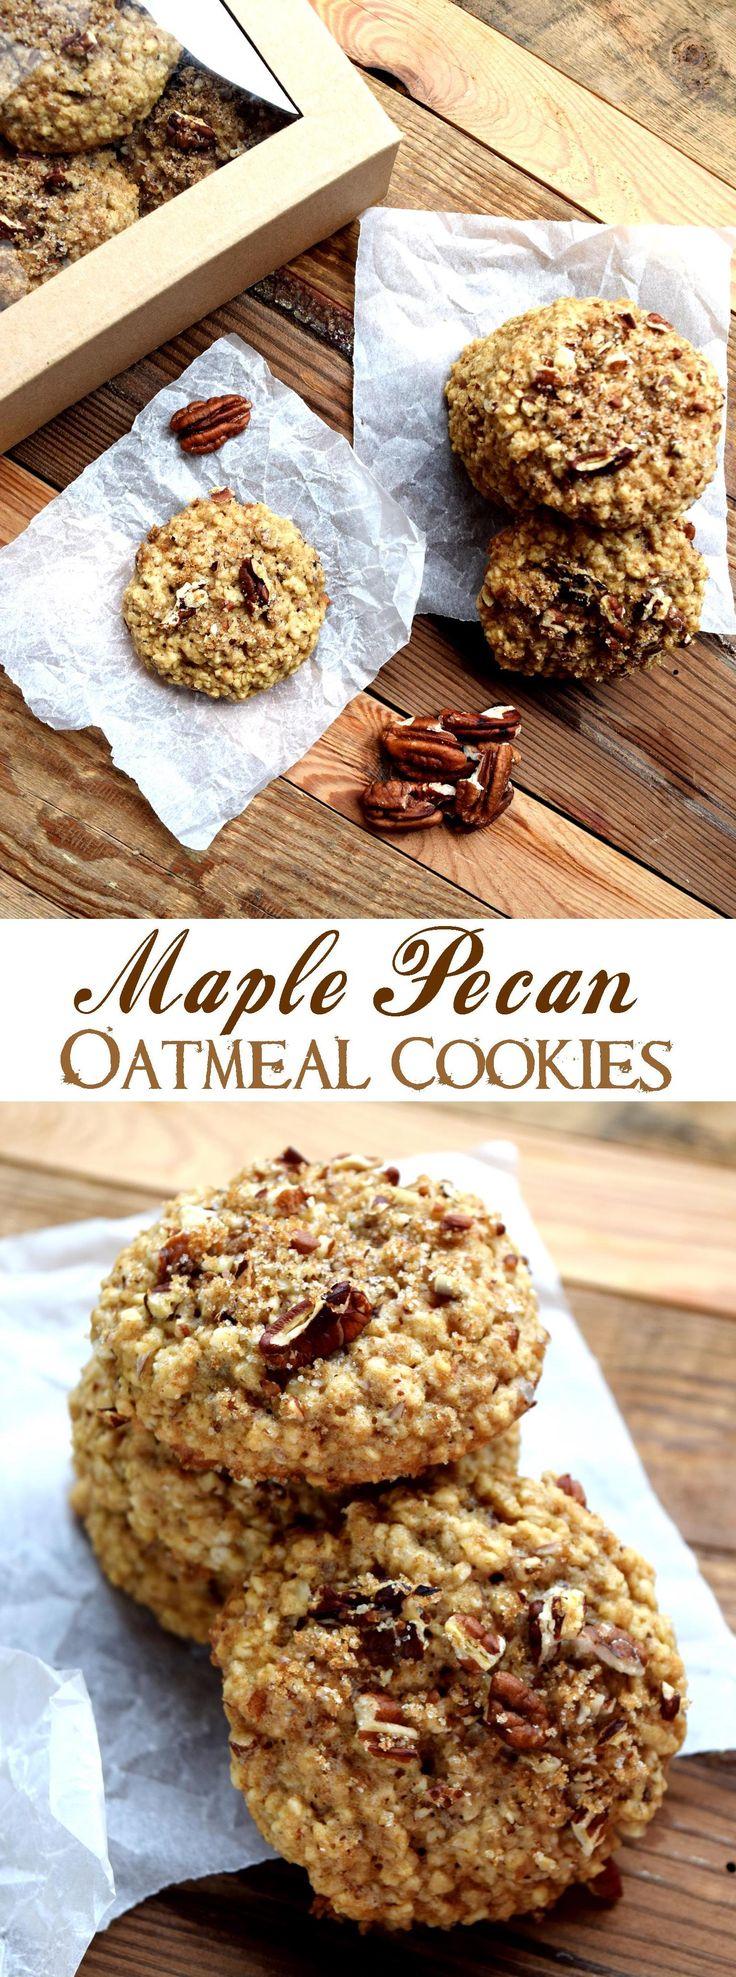 Maple Pecan Oatmeal Cookies